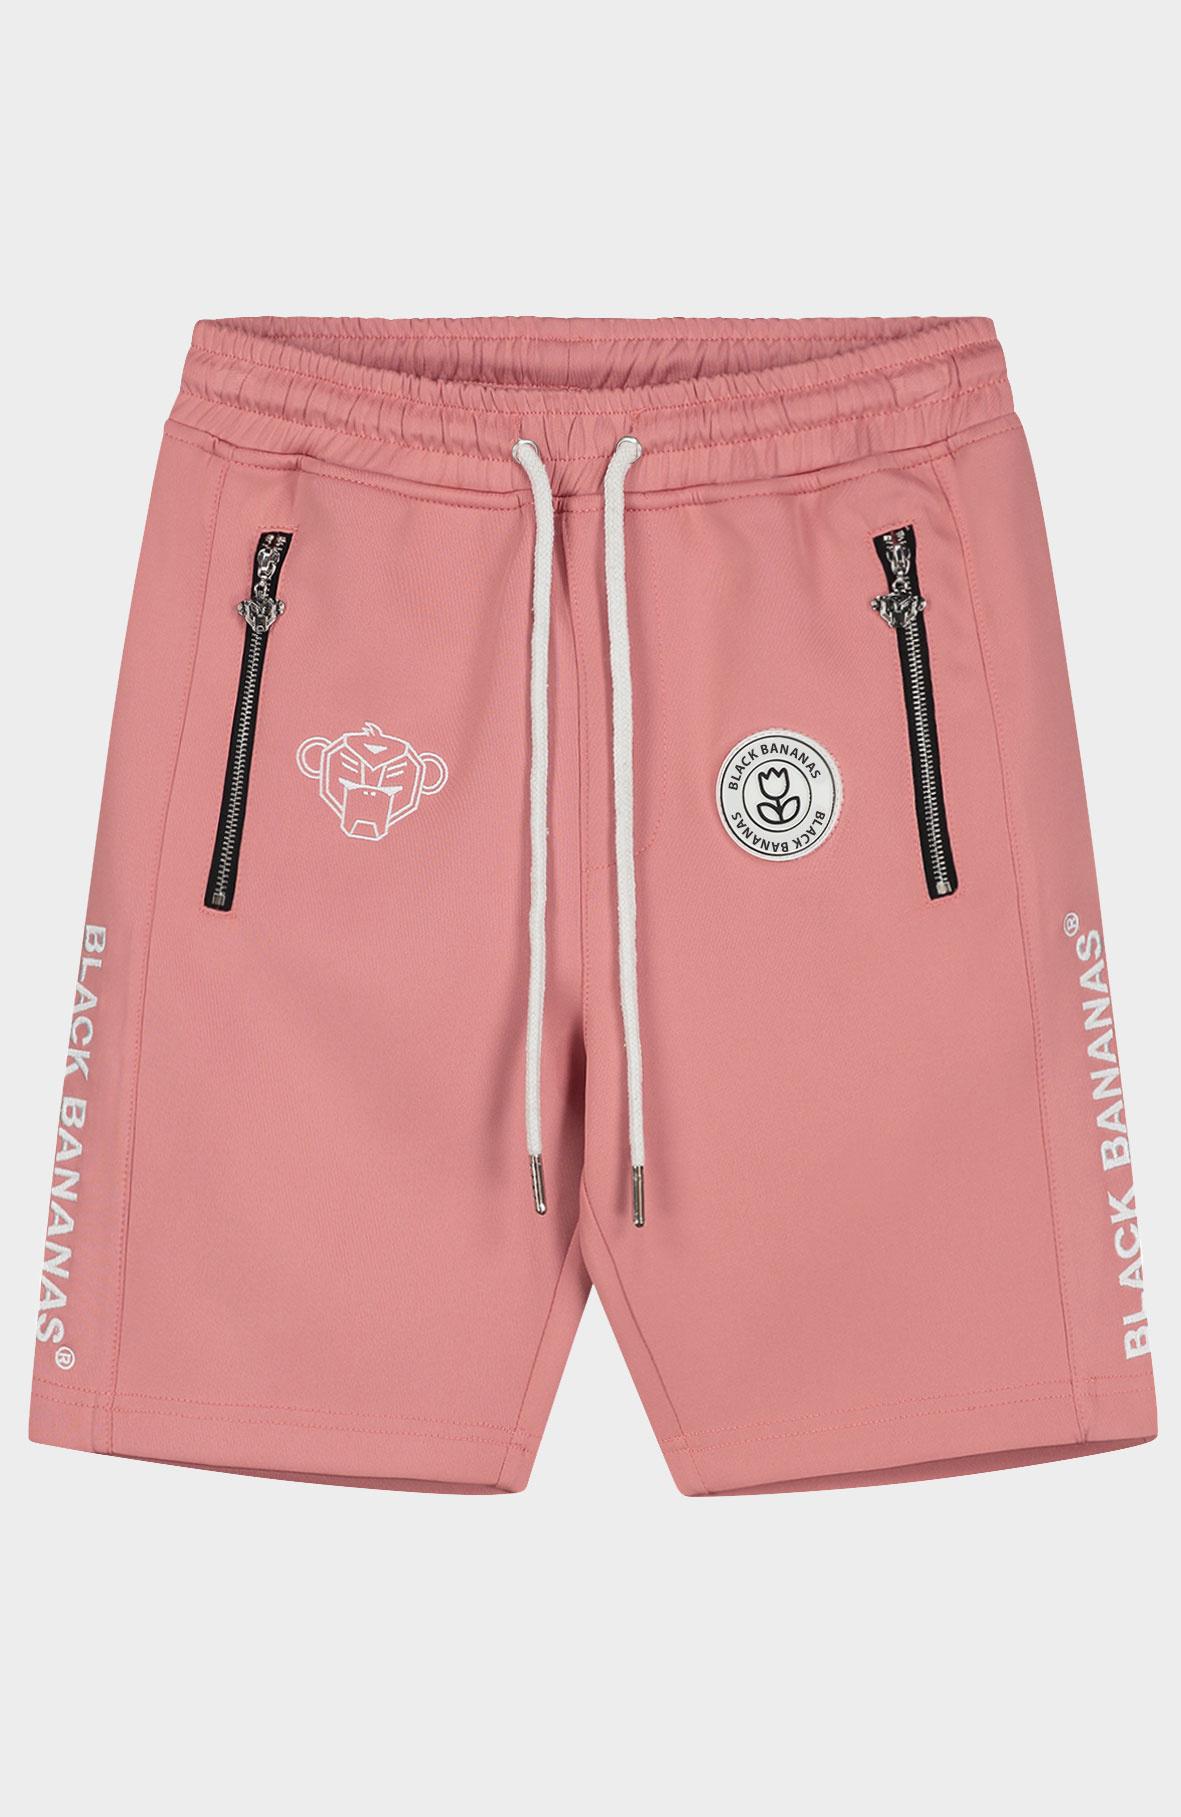 Jr. F.C Basic Short Pink-1